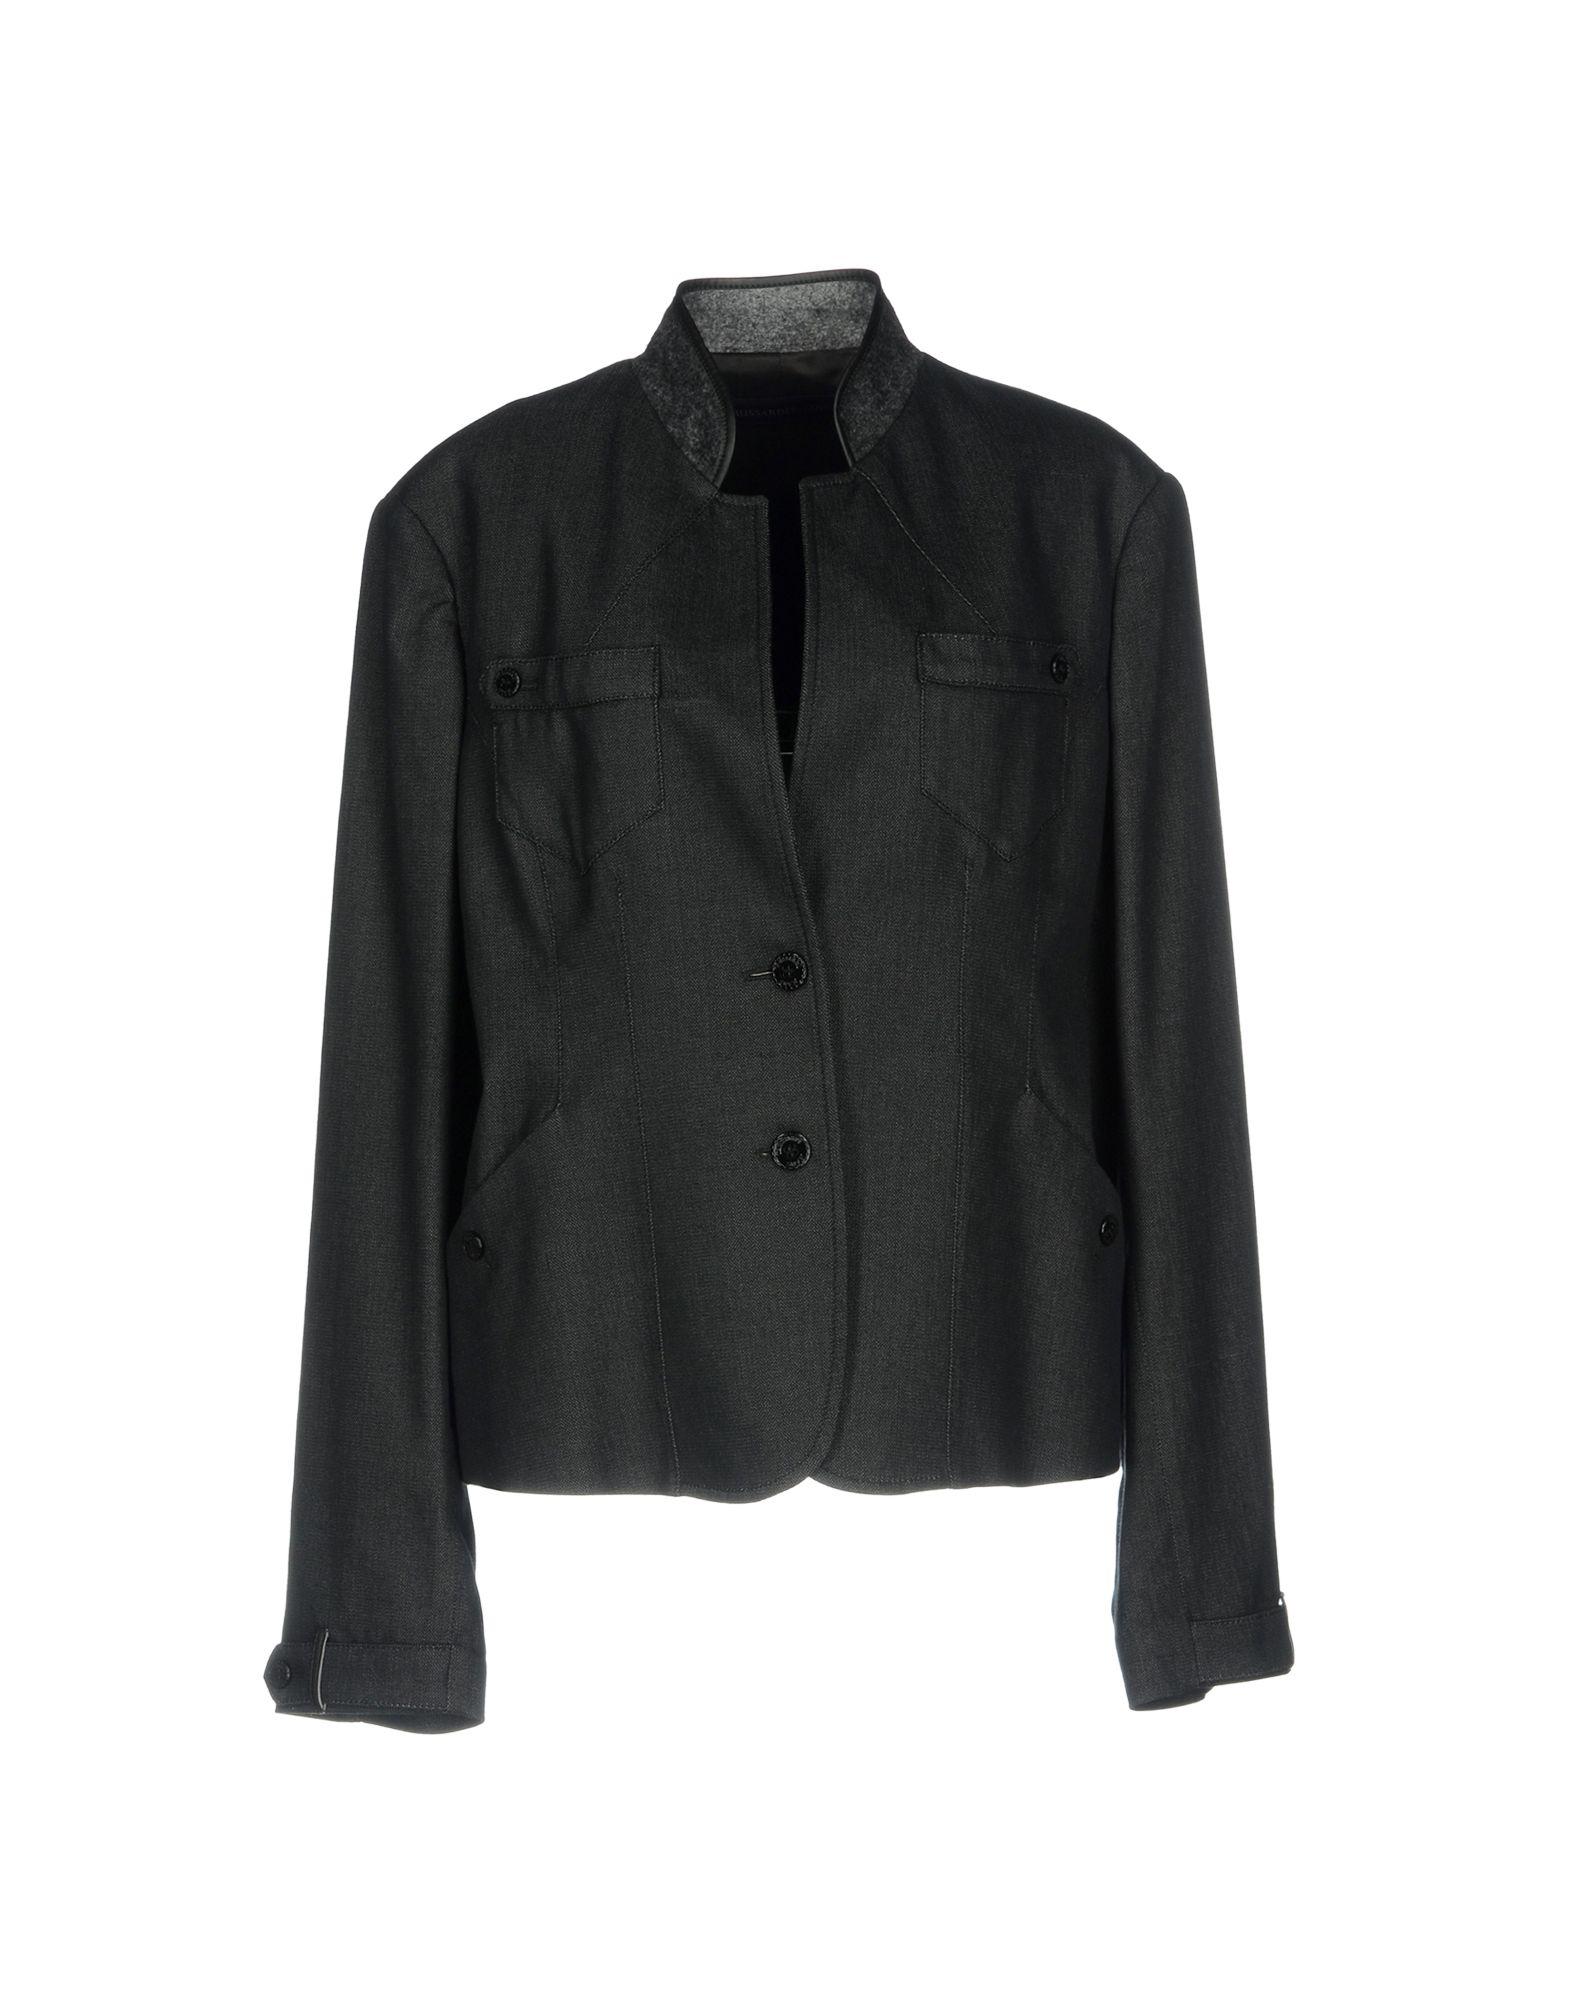 TRUSSARDI JEANS Пиджак пиджак trussardi пиджак